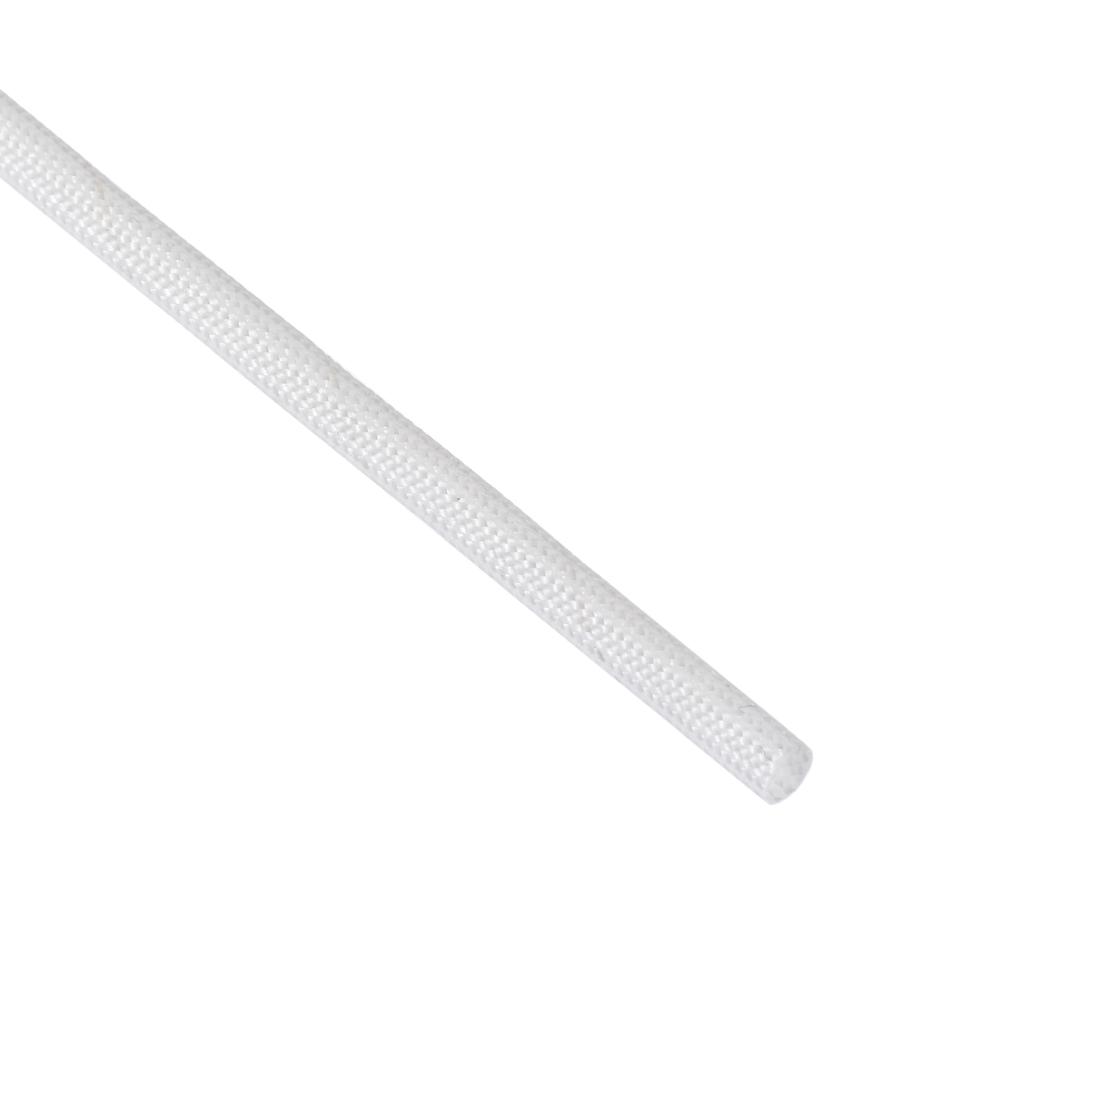 Silicone Rubber Fiberglass Insulation Retardant Sleeving 3mmx10M White